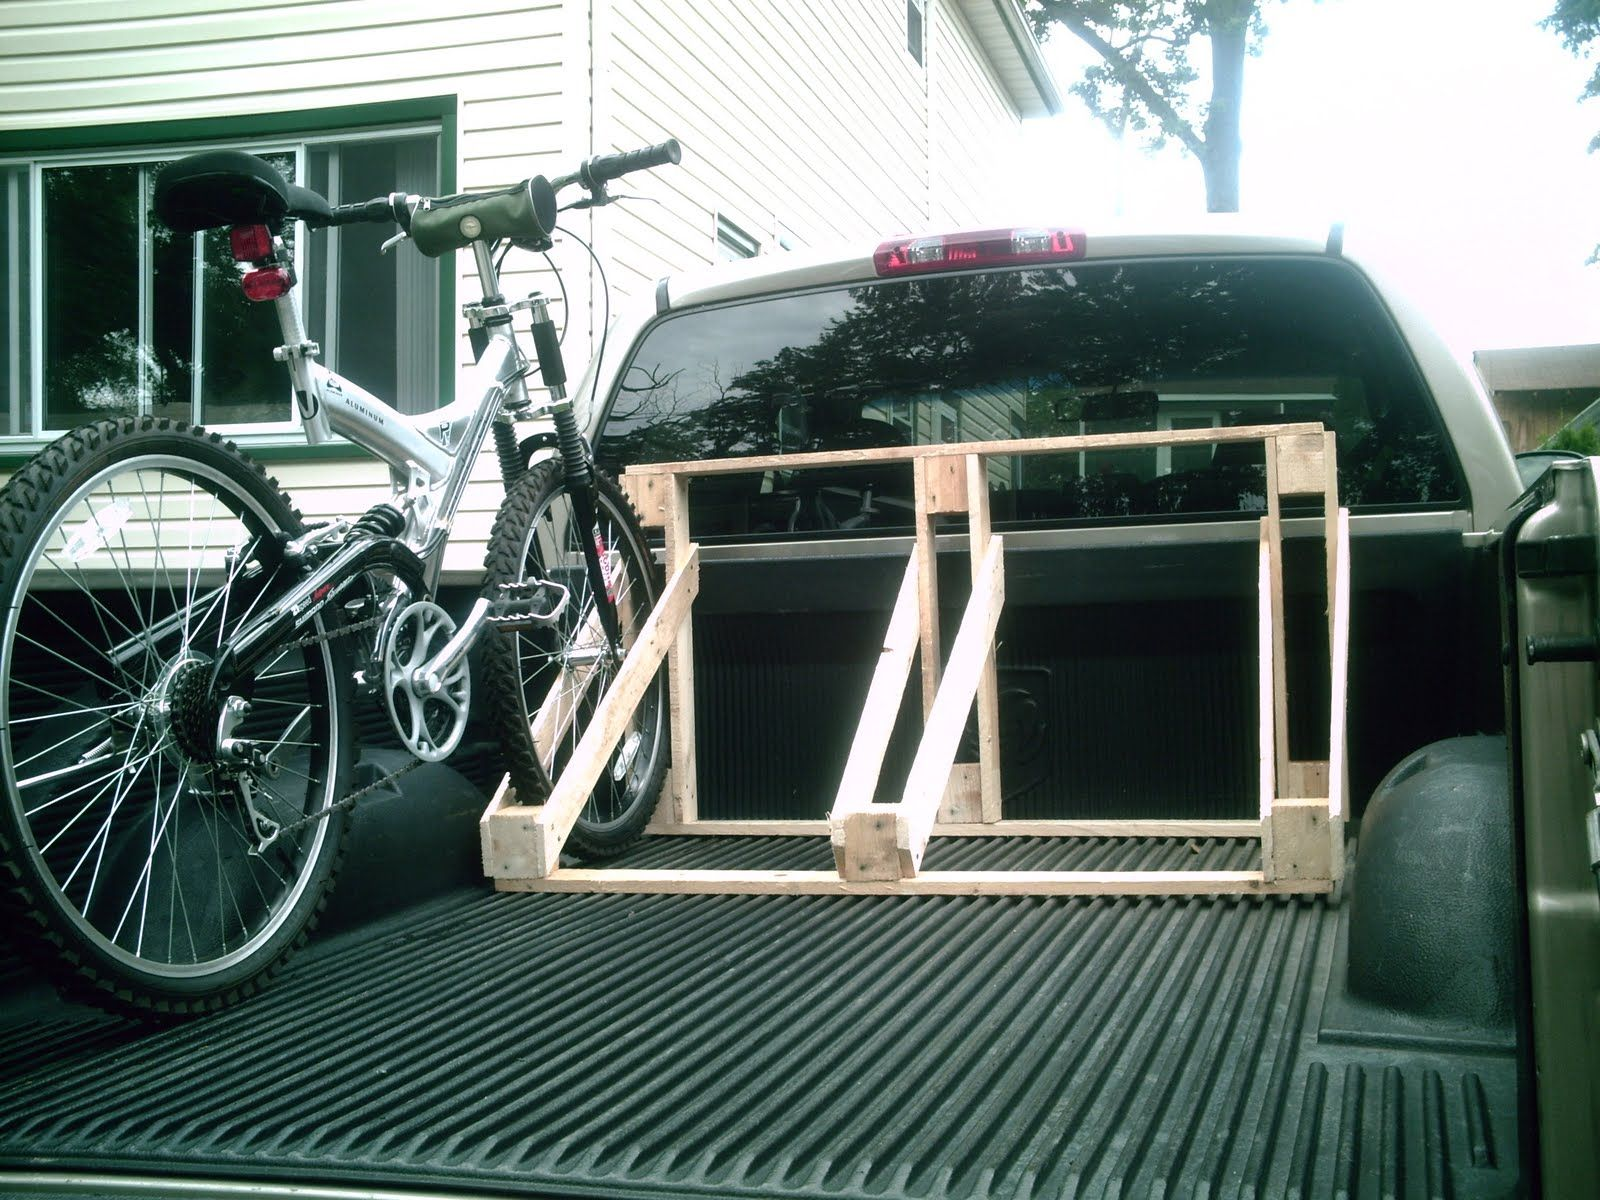 nv products rack folded angle kuat down racks hitch larger view bike